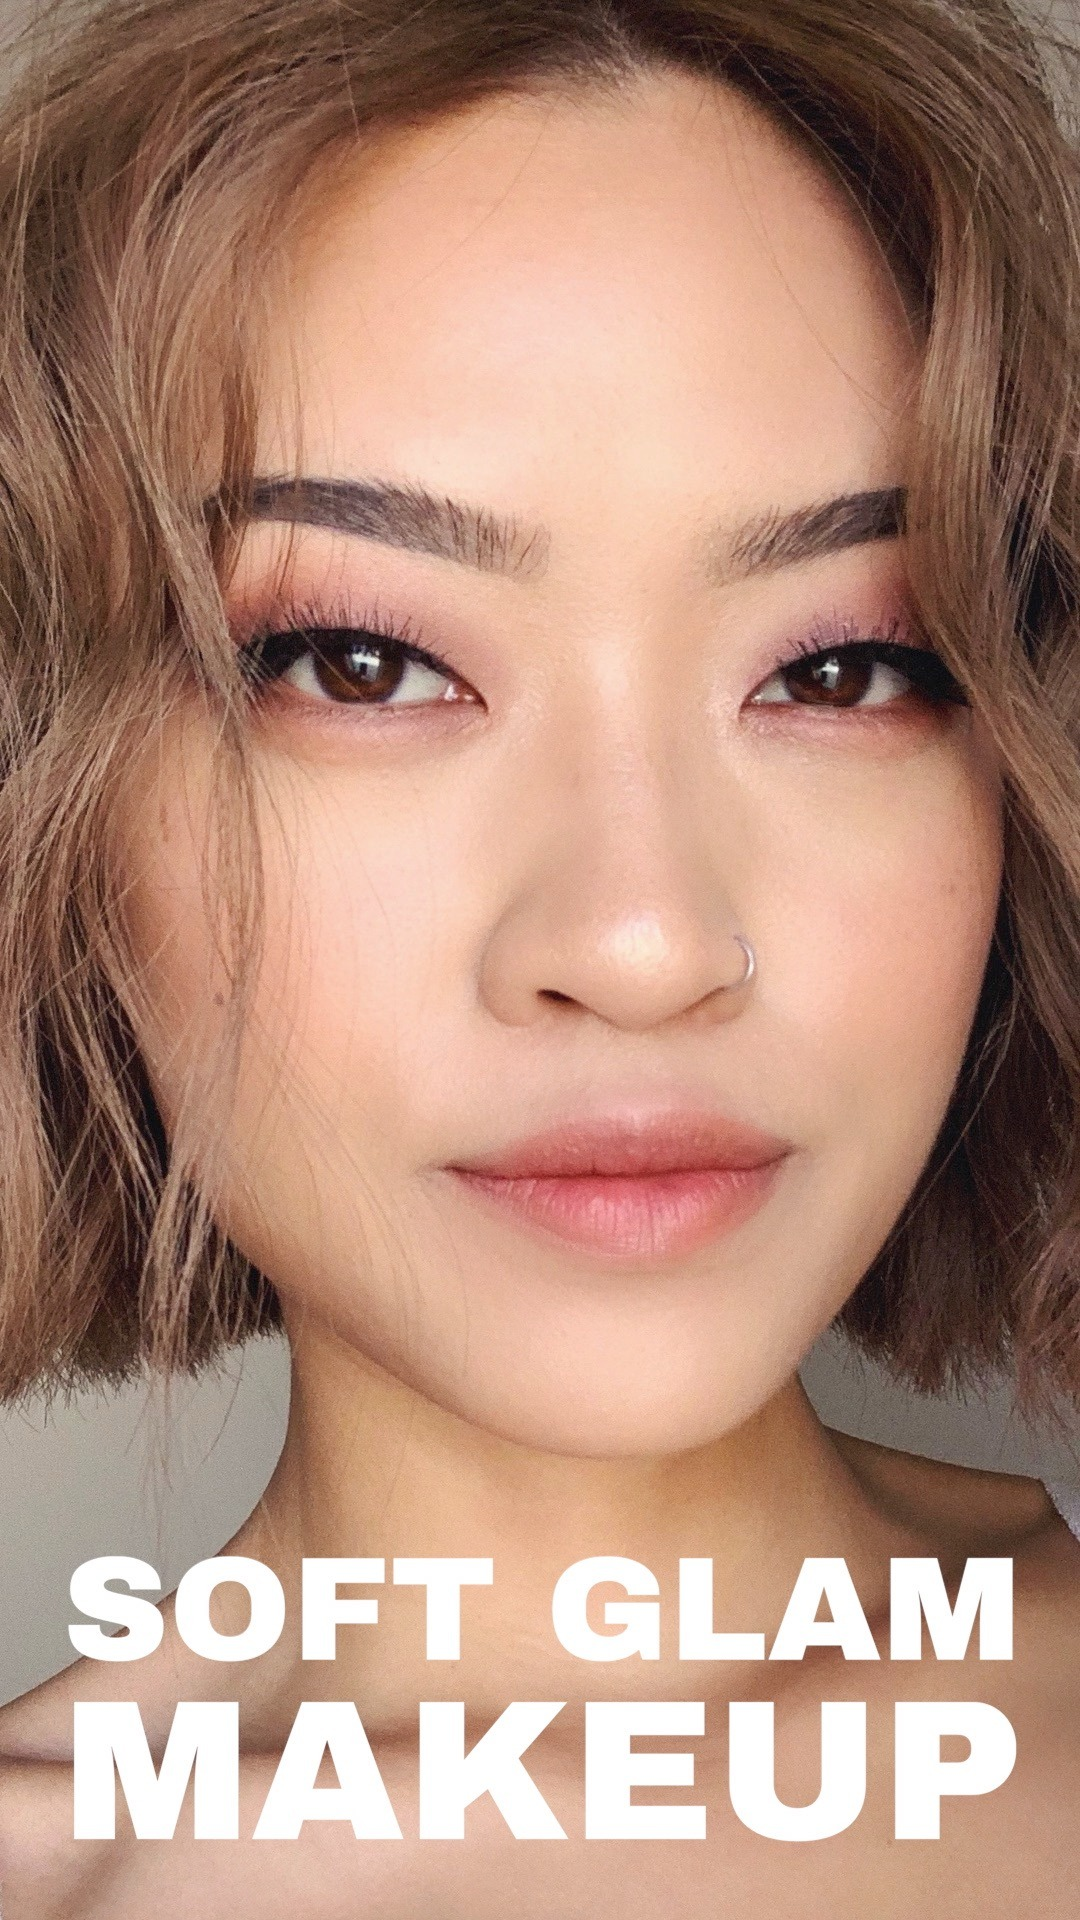 Soft Glam Aesthetic Makeup Tutorial